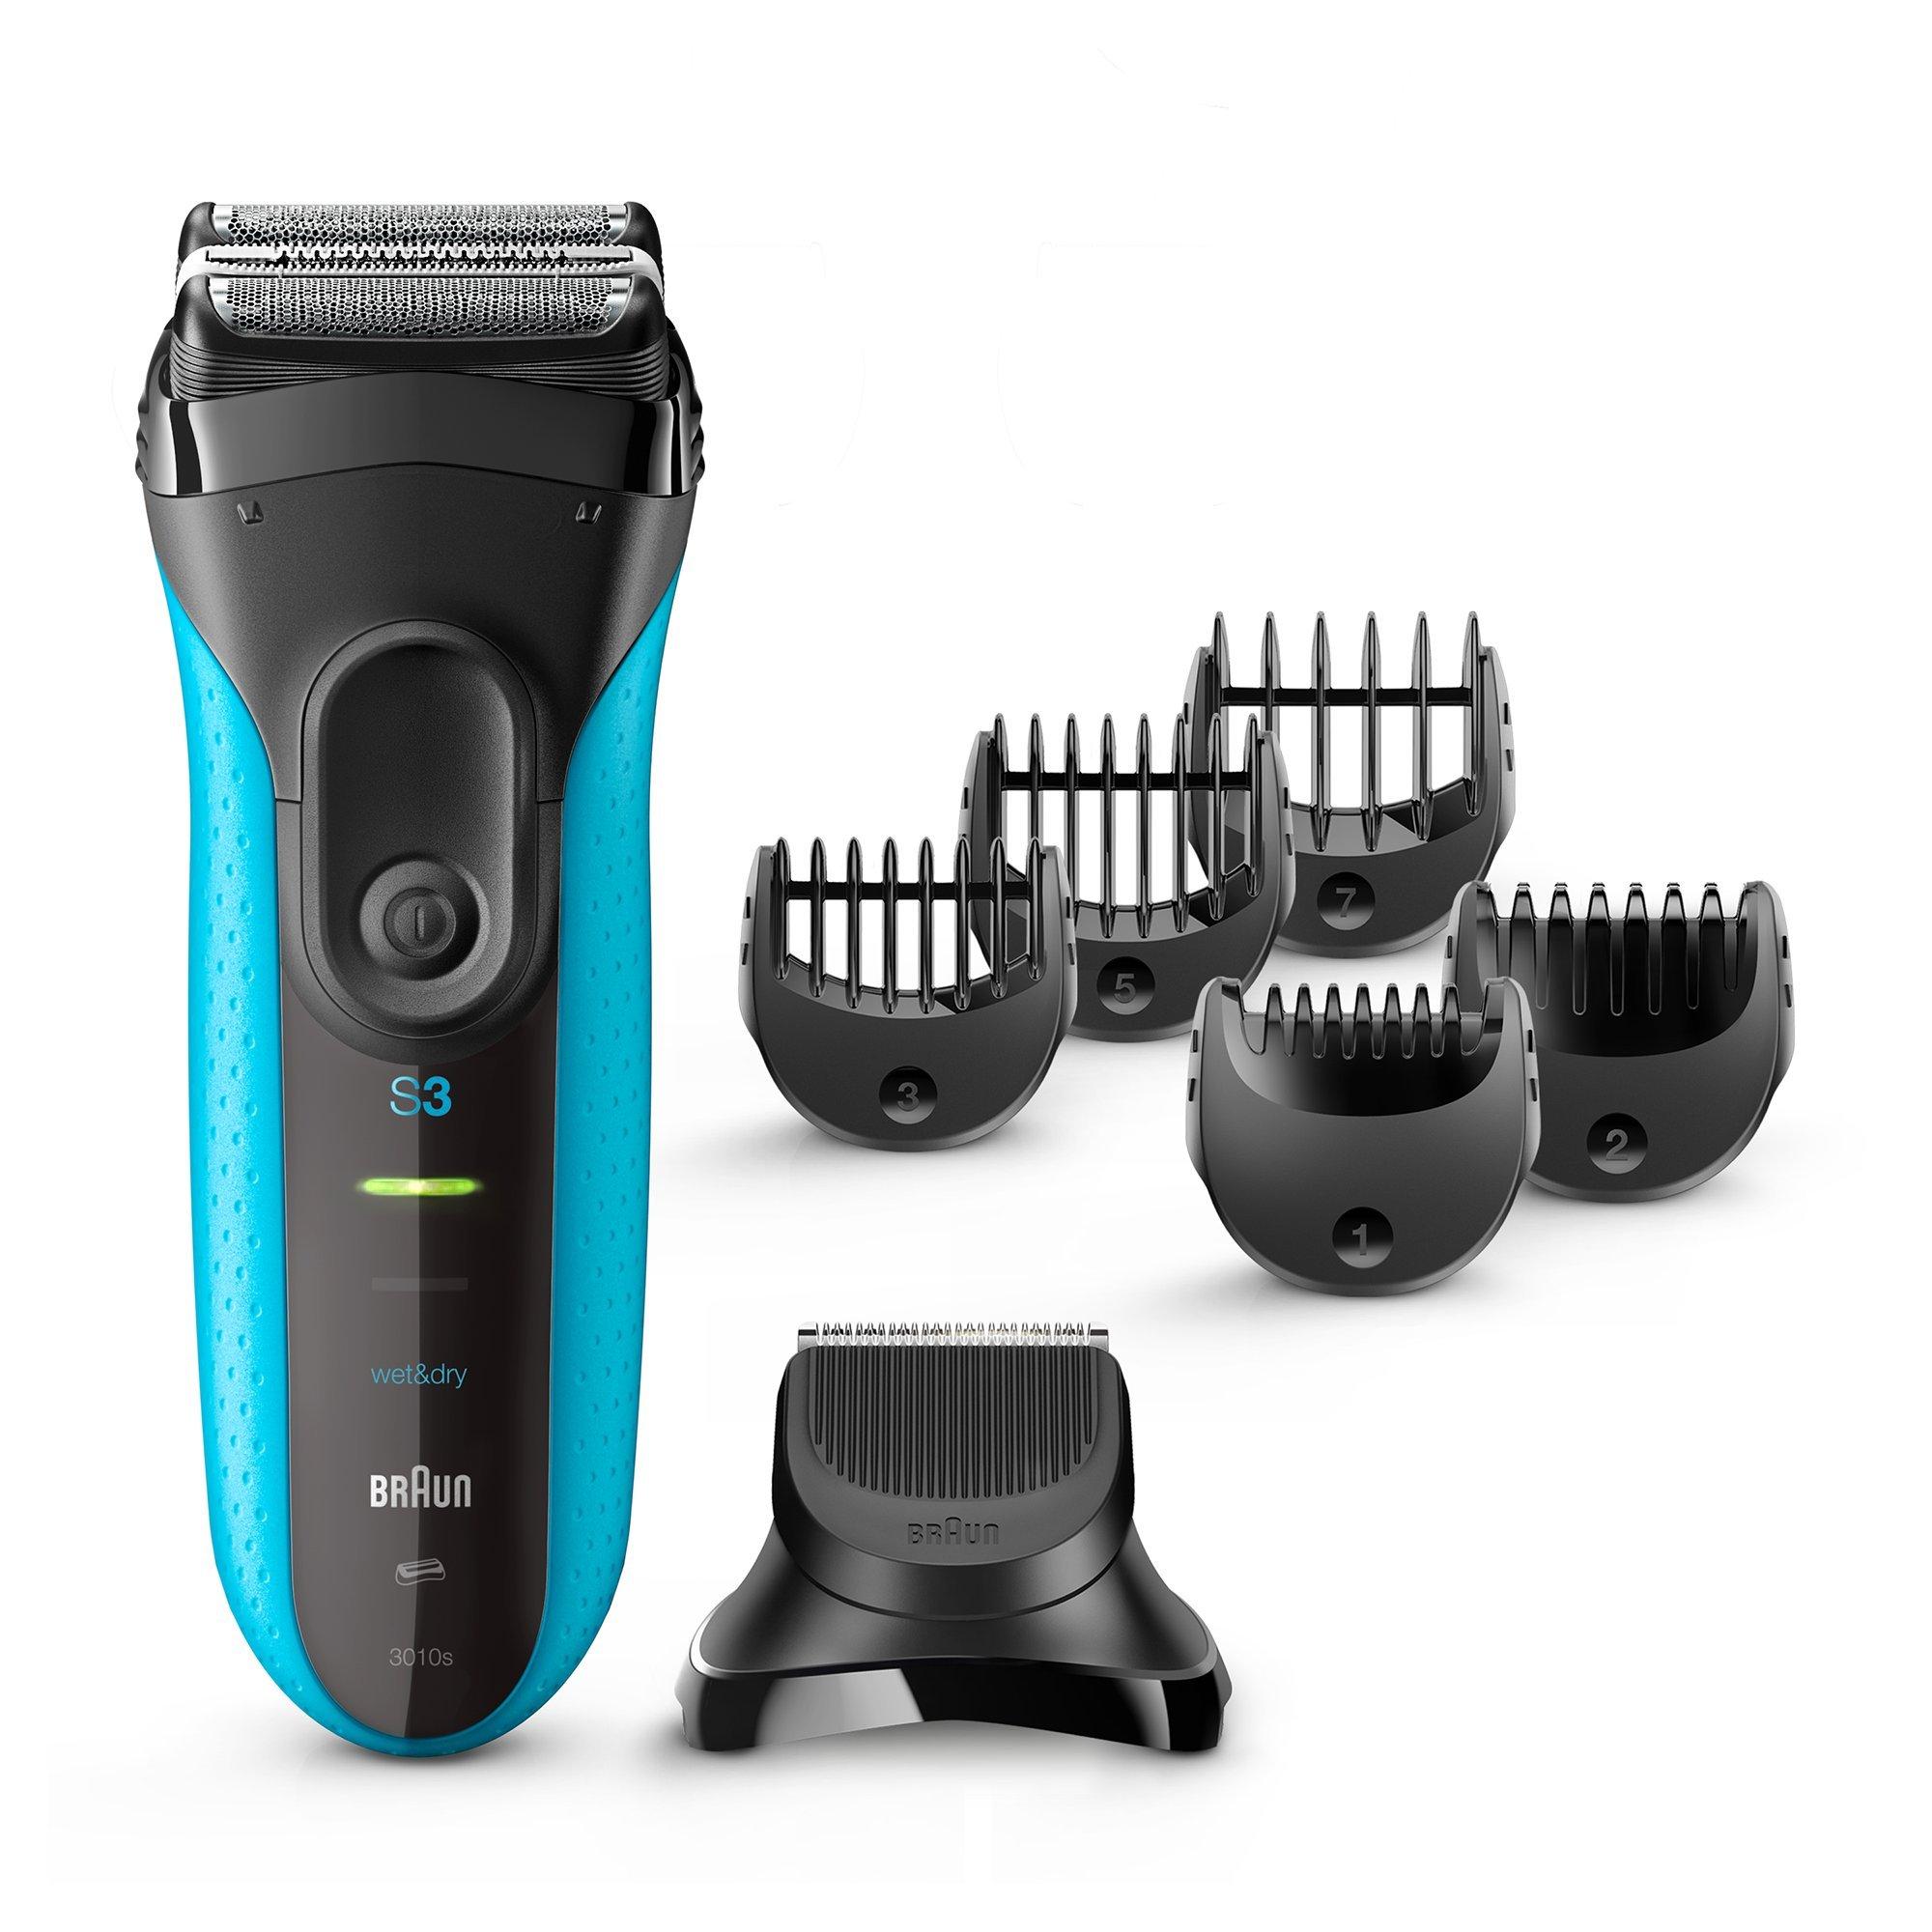 Braun Series 3 3010BT Men's Beard Trimmer/Hair Clipper, Razor, Foil Shaver, Blue & Black by Braun